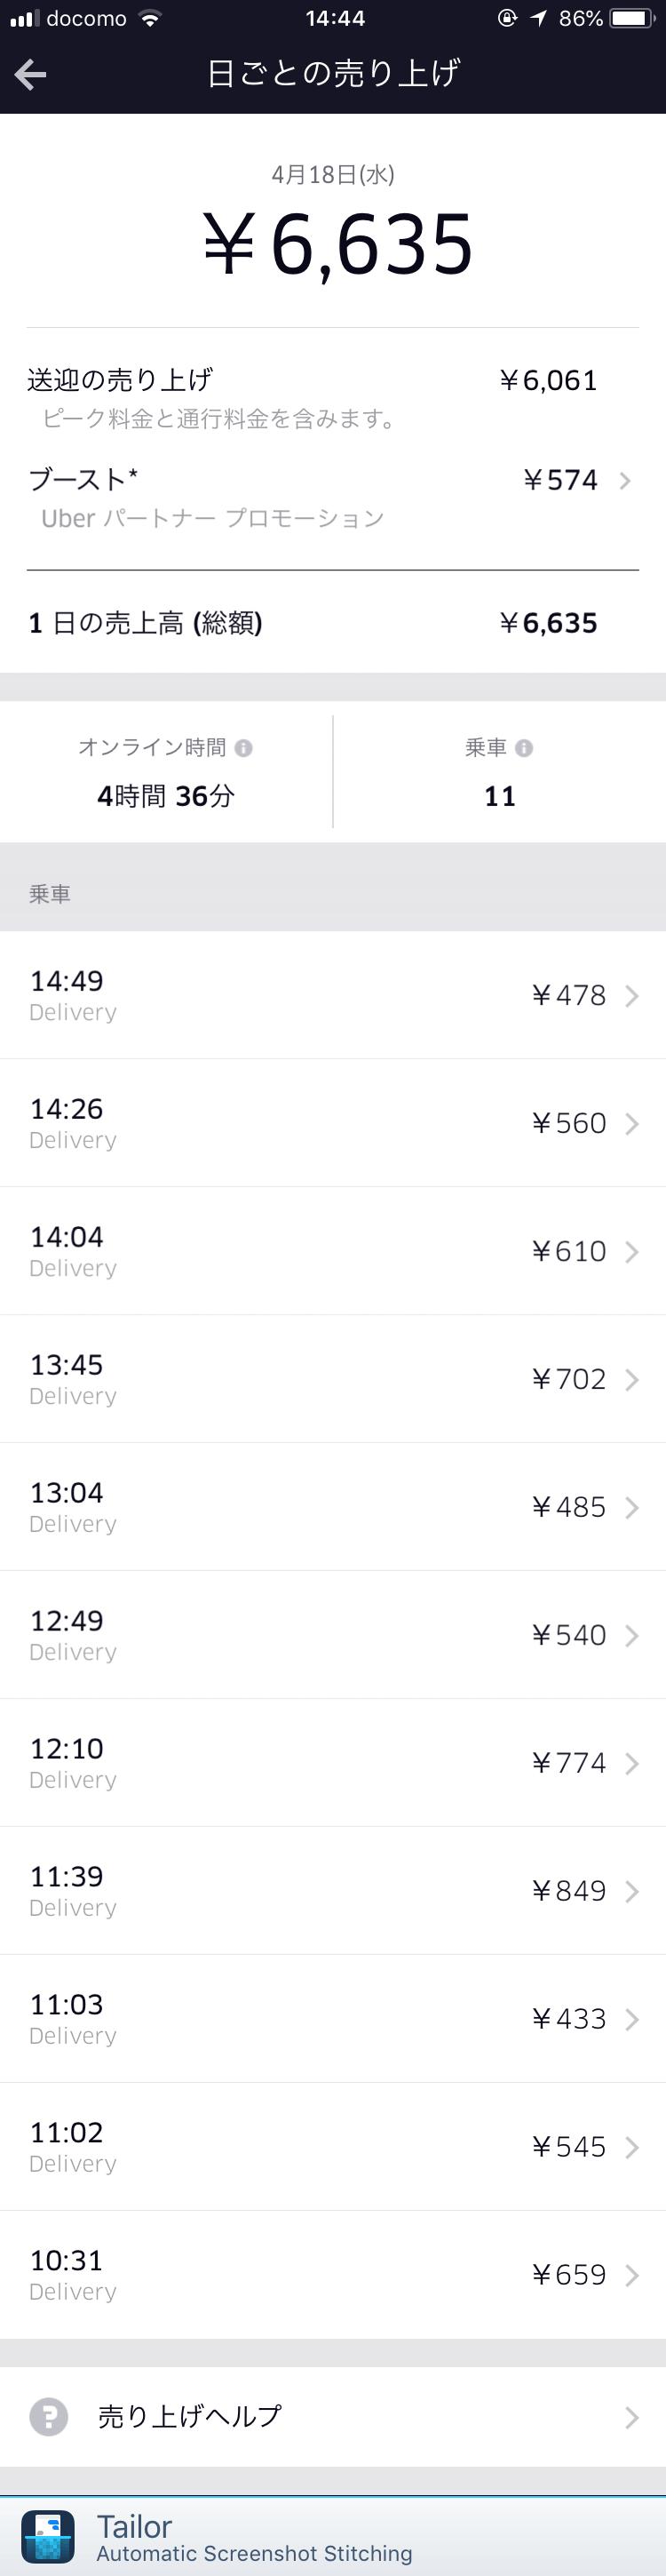 【Uber Eats配達】4月18日の配達結果